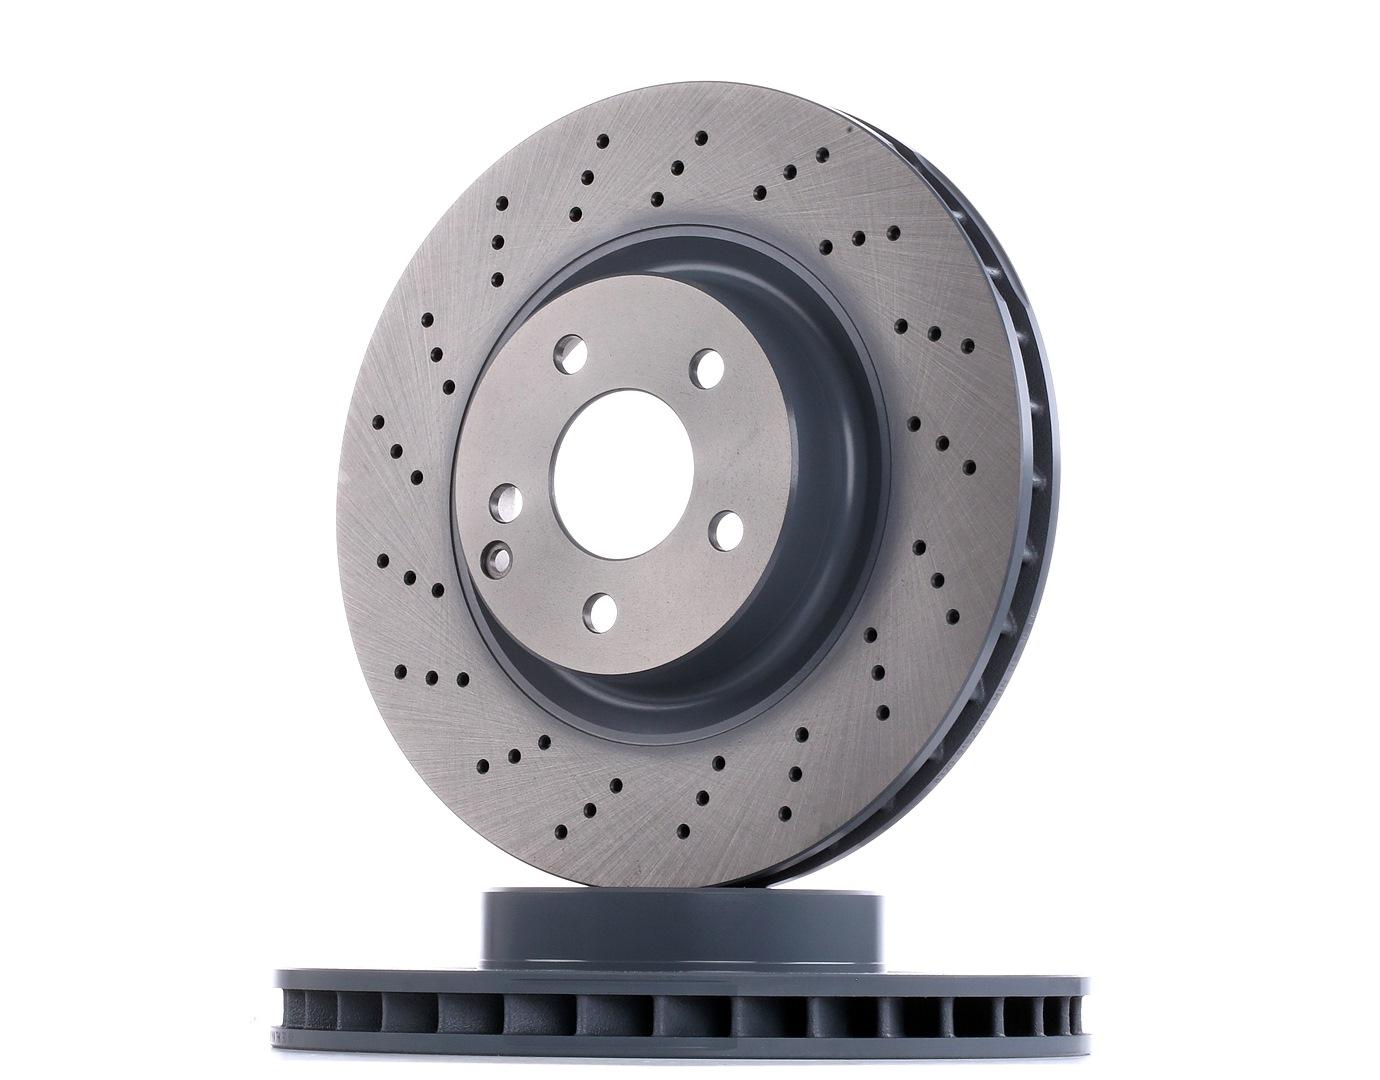 of Holes 5 febi bilstein 37725 Brake Disc 1 Brake Disc front No perforated // internally ventilated